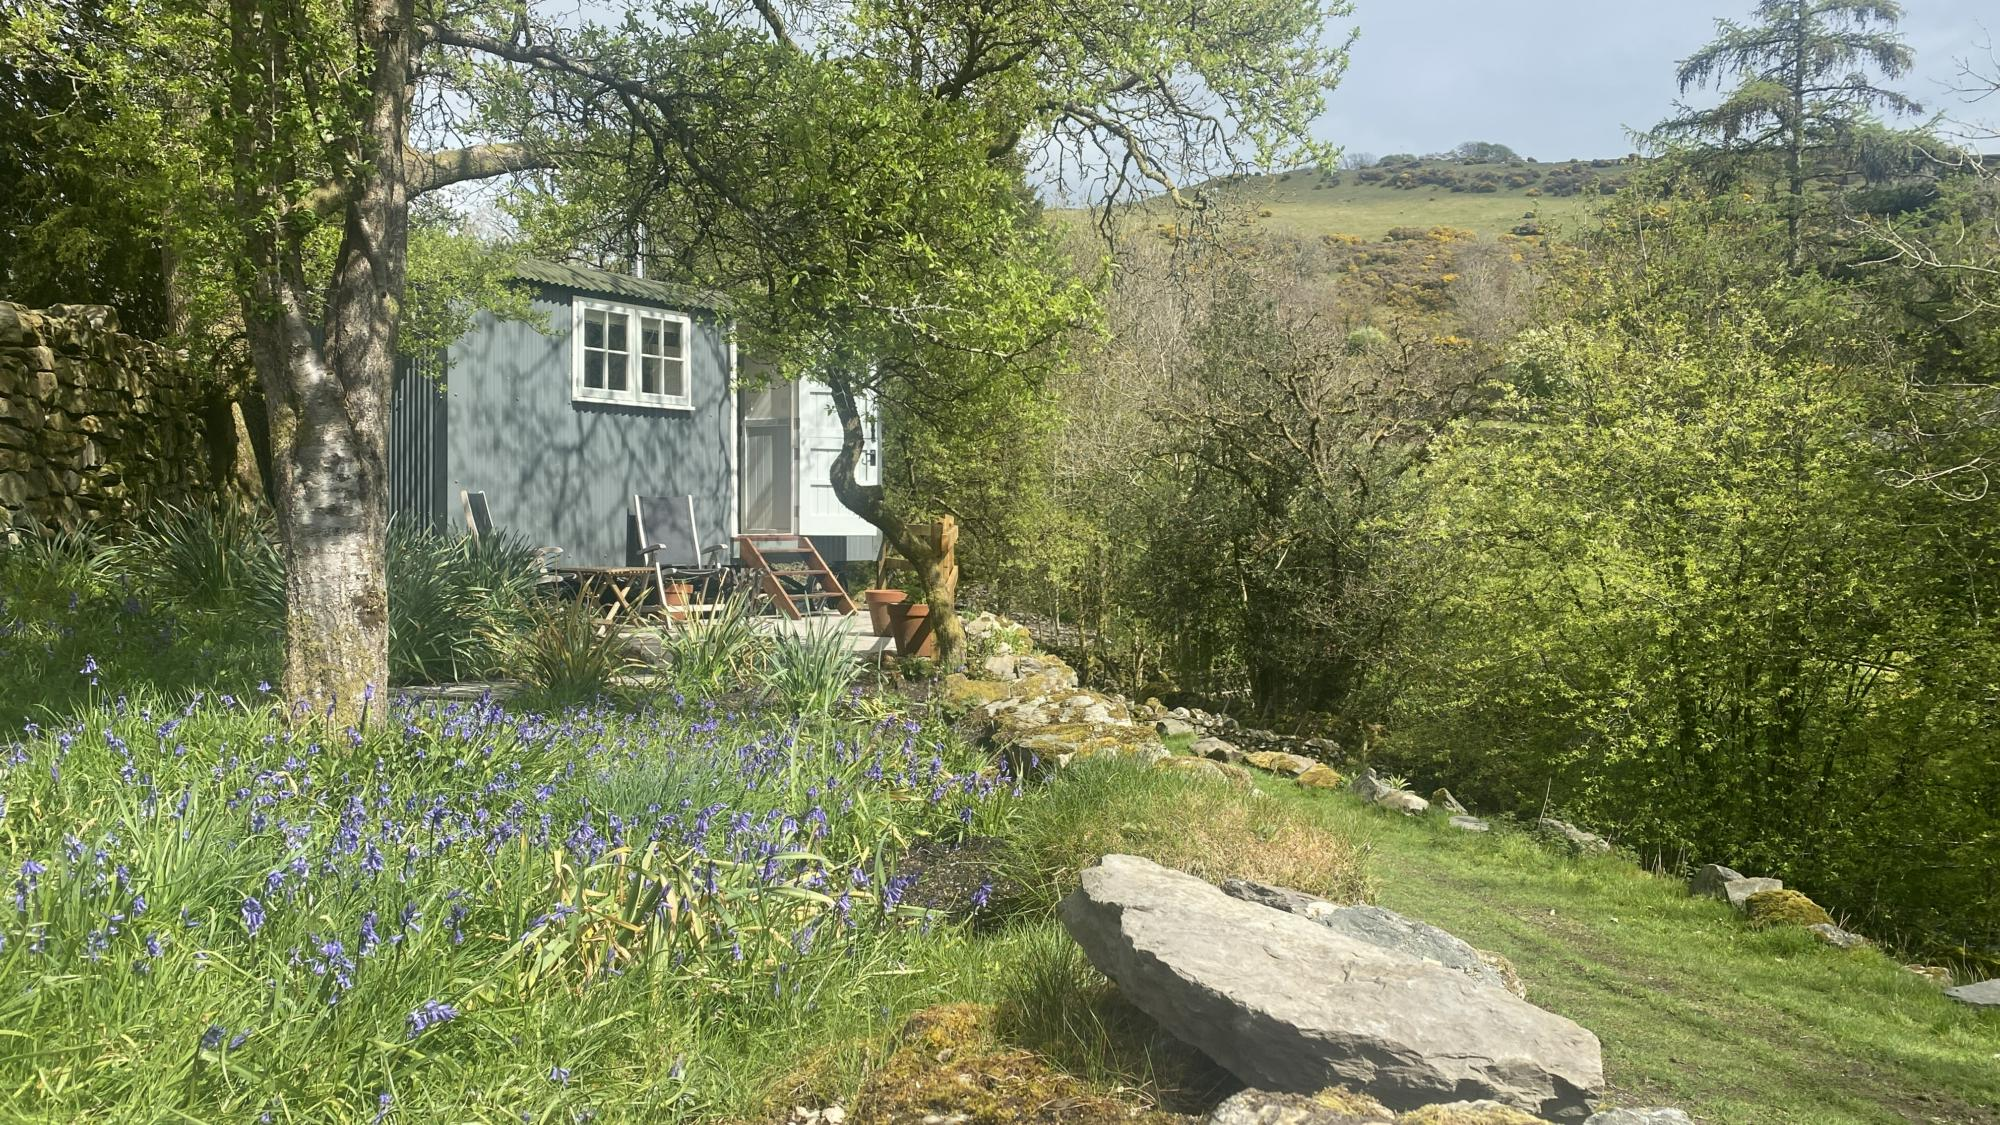 Campsites in North West England – I Love This Campsite